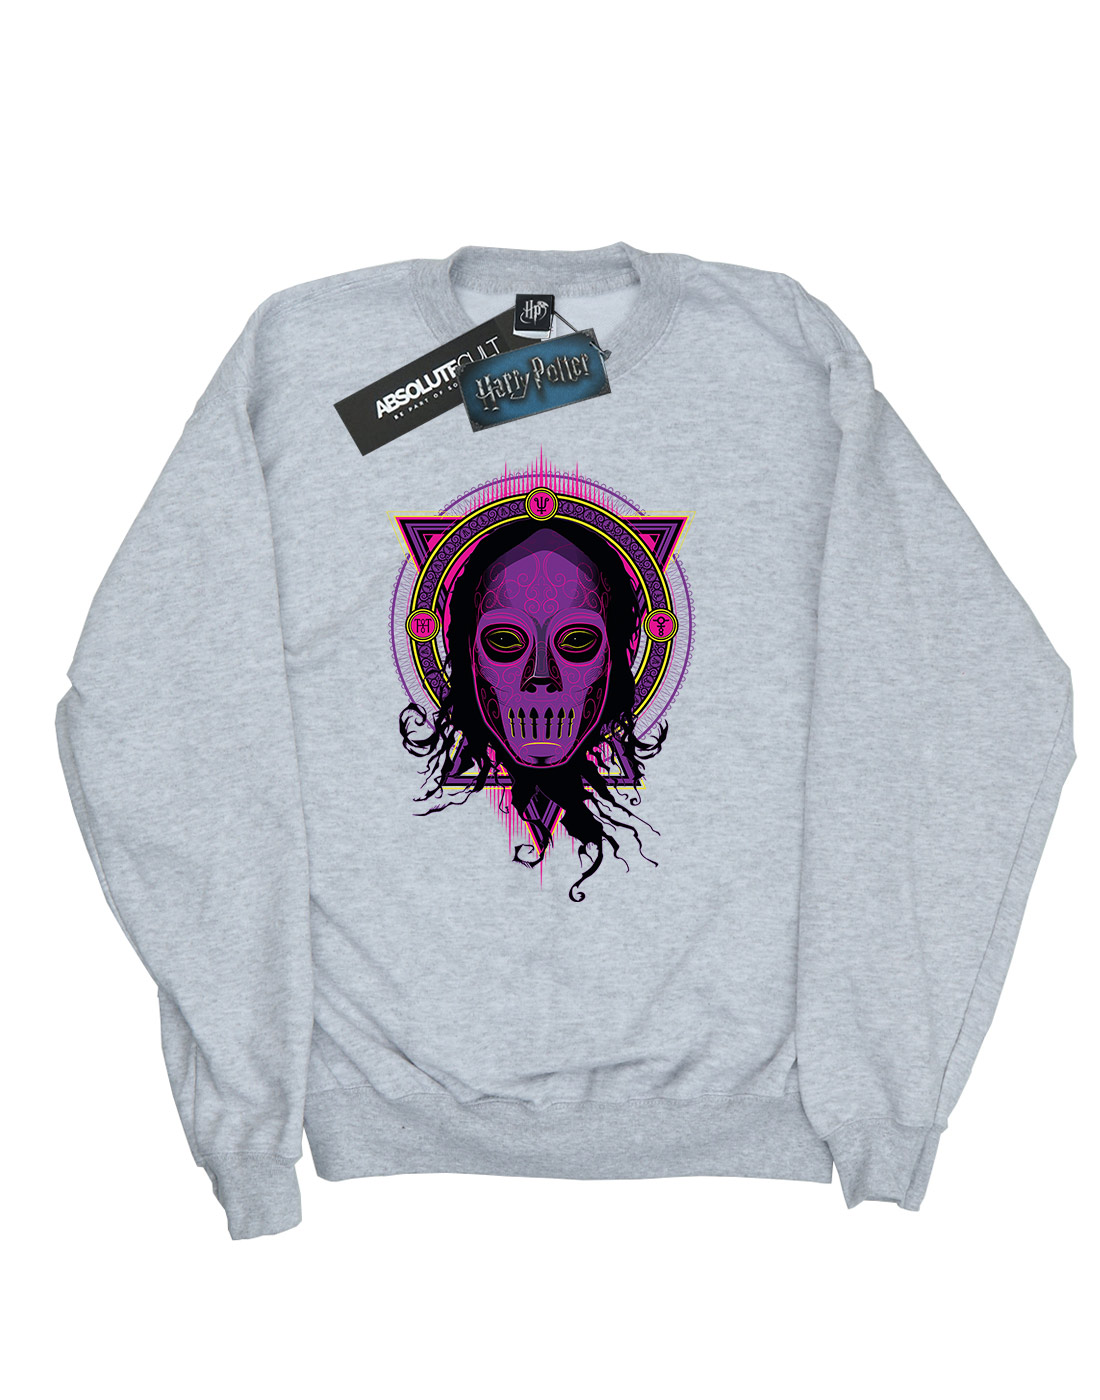 Harry Potter Herren Neon Death Eater Sweatshirt  | Auktion  Auktion  Auktion  7e002f